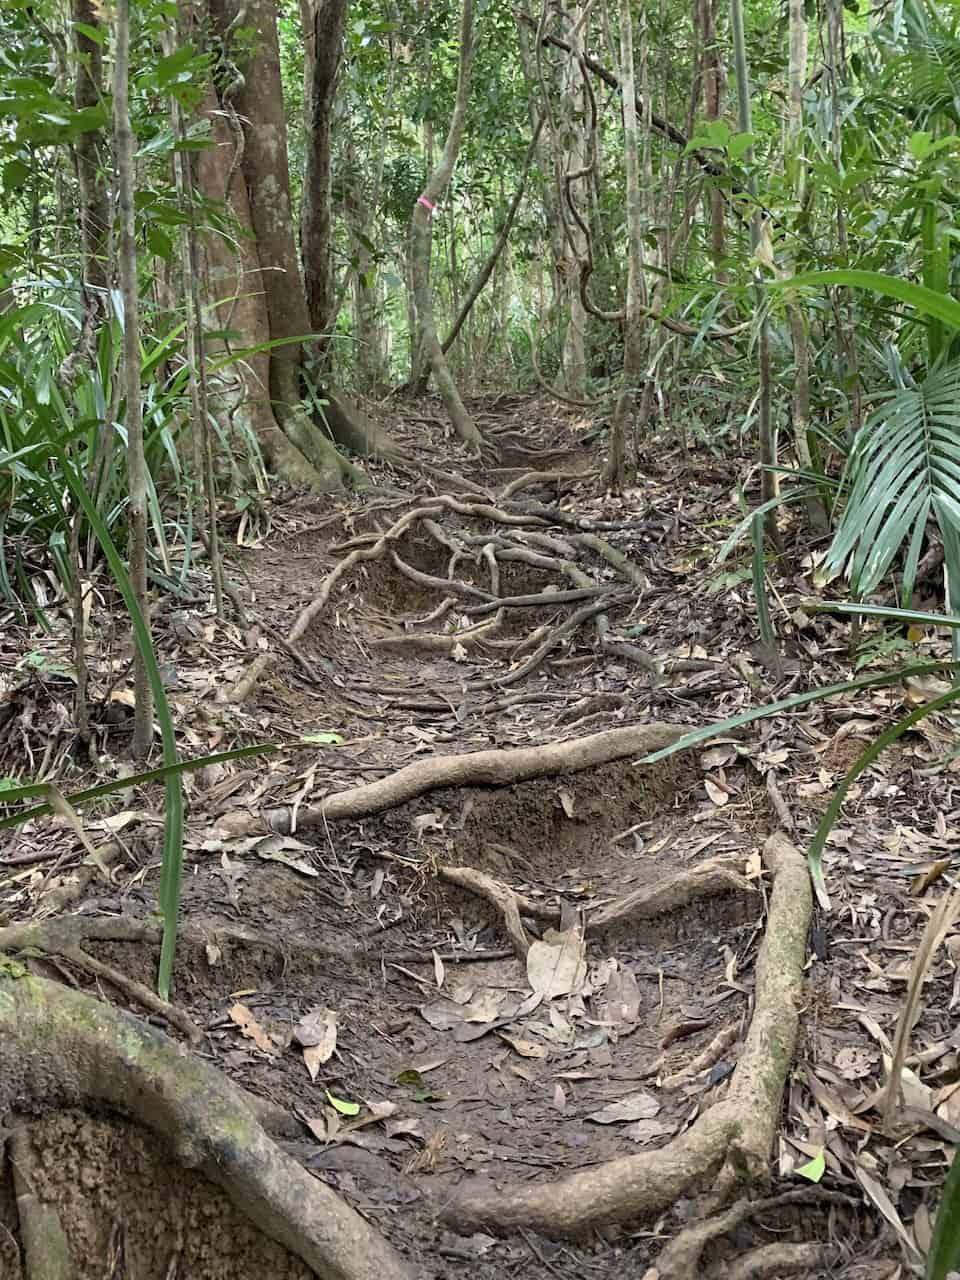 Mount Sorrow Trail